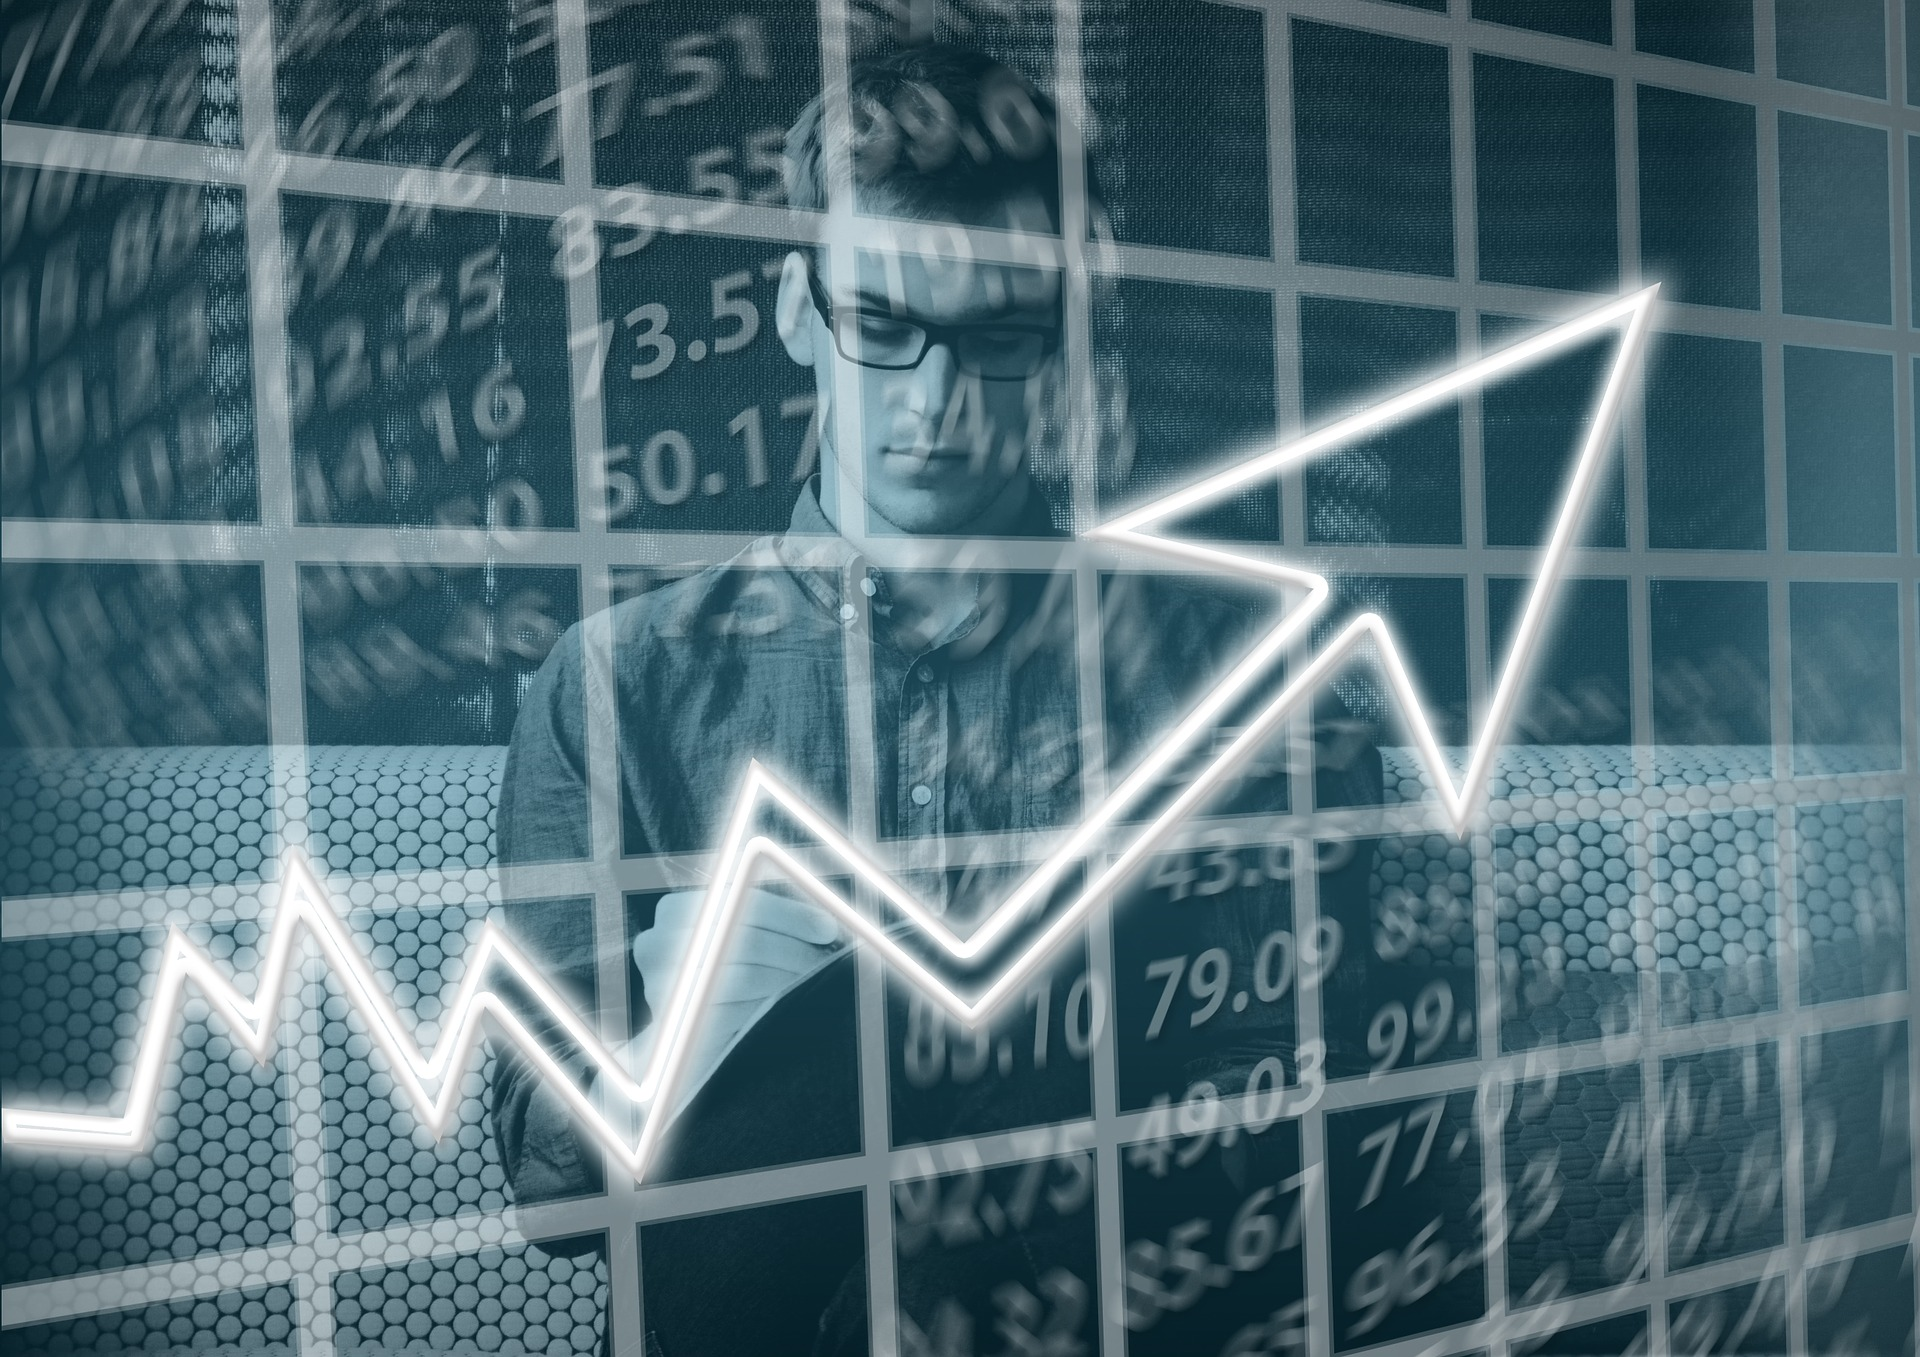 Anaxco Blog Beitrag Bild Graph IT-Servies IT-Lösungen IT-Experten Logistik-IT TMS Cloud Datensicherheit